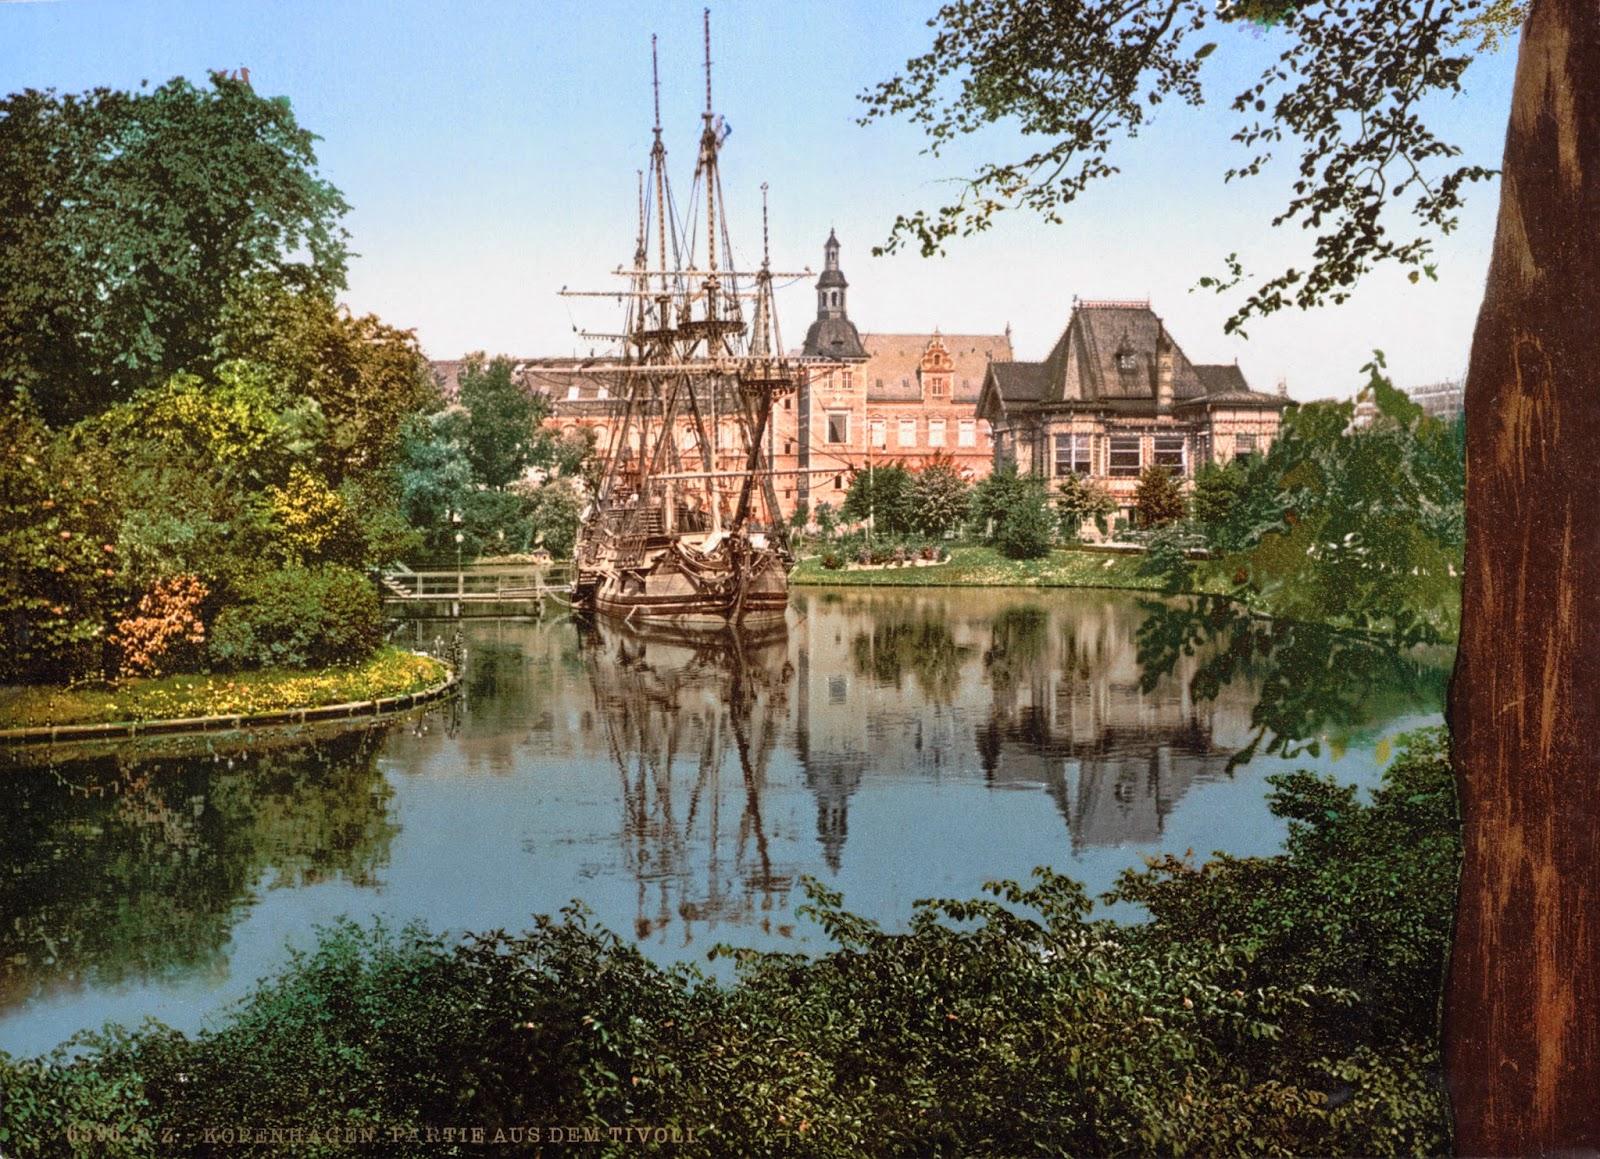 Tivoli Gardens, Copenhagen - Travel Guide | Tobias Kappel